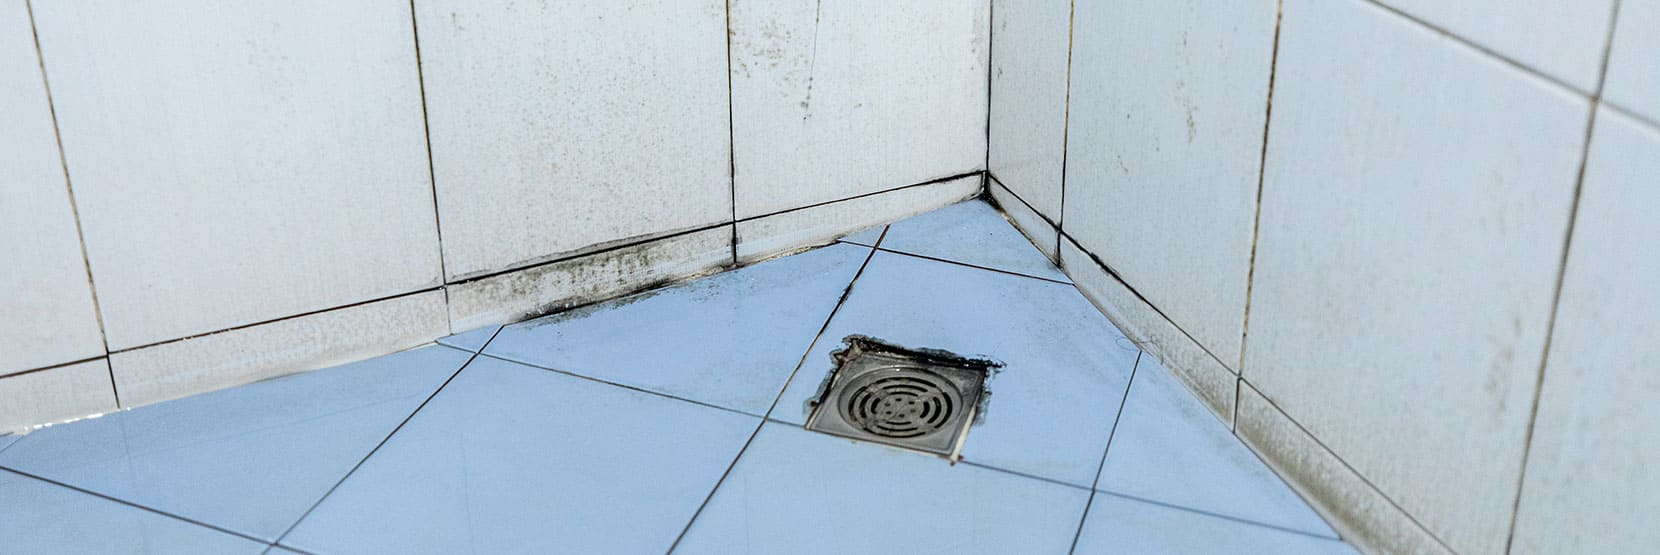 Hoe kun je schimmel in de badkamer voorkomen?